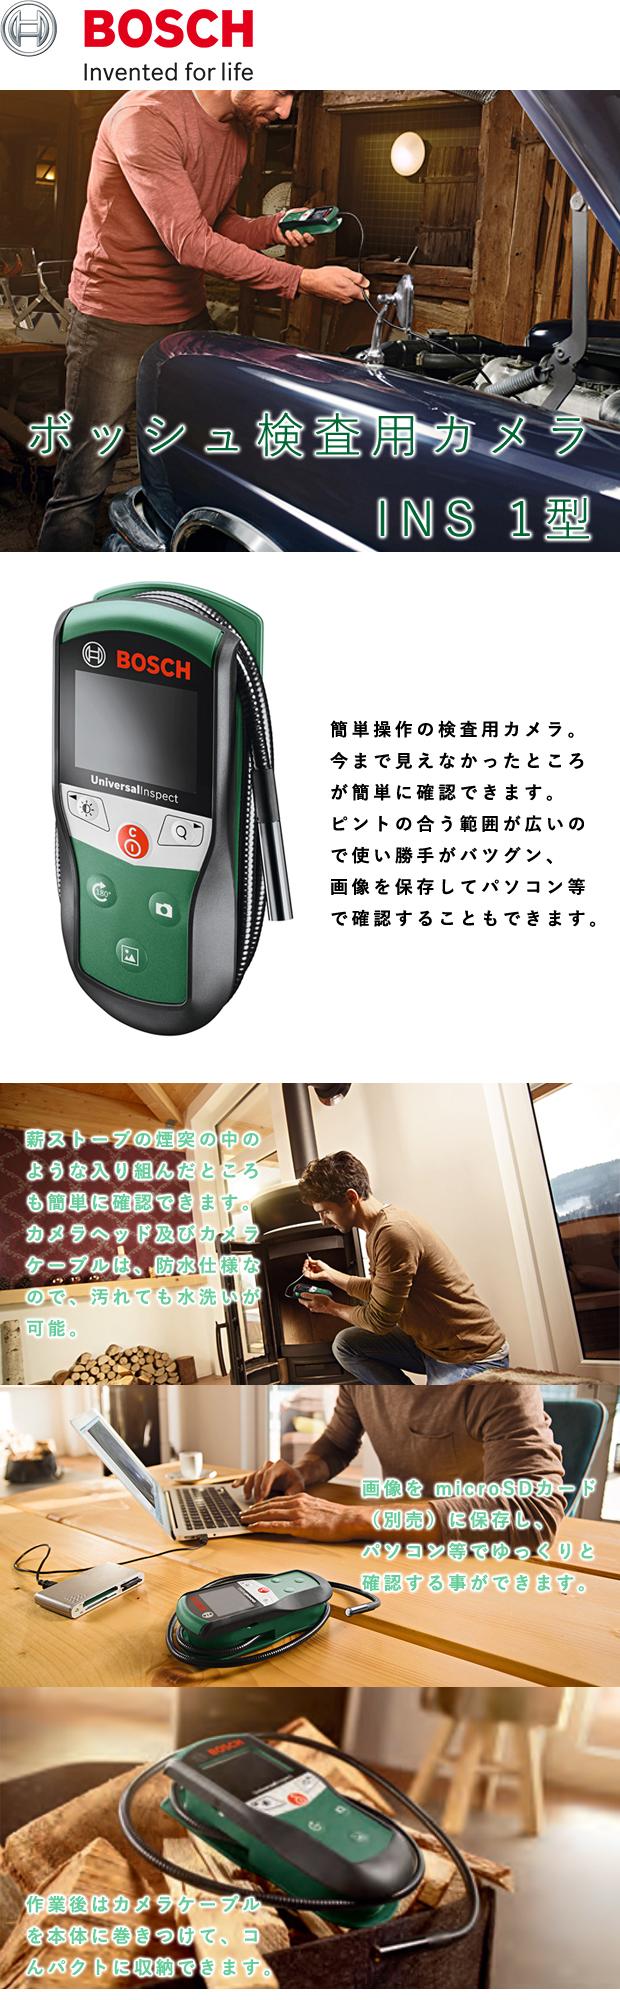 BOSCH 検査用カメラ INS 1型